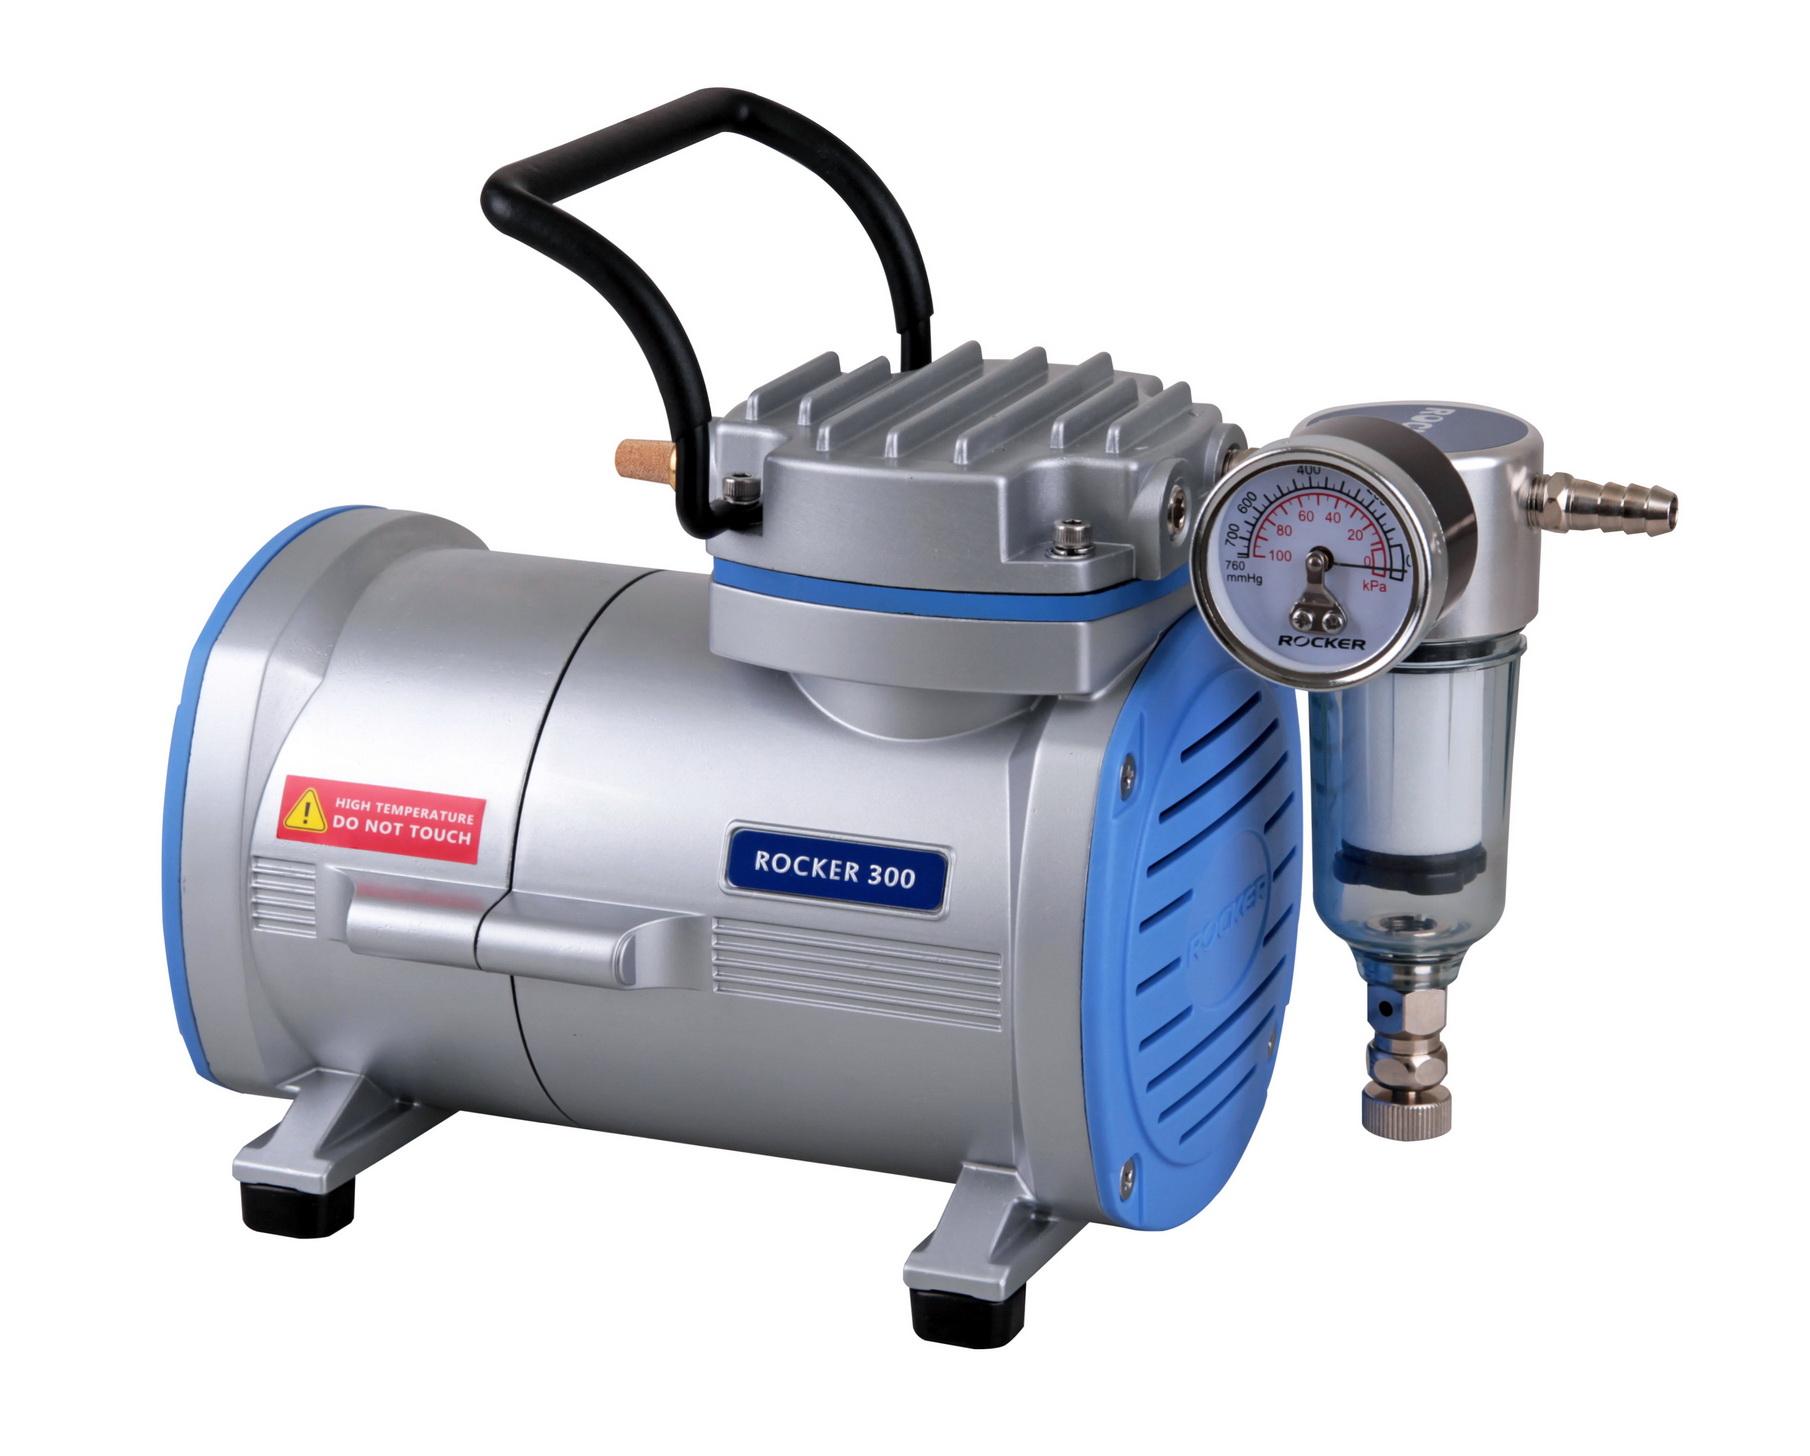 New Rocker 300 实验室真空泵无油式真空泵 、真空泵